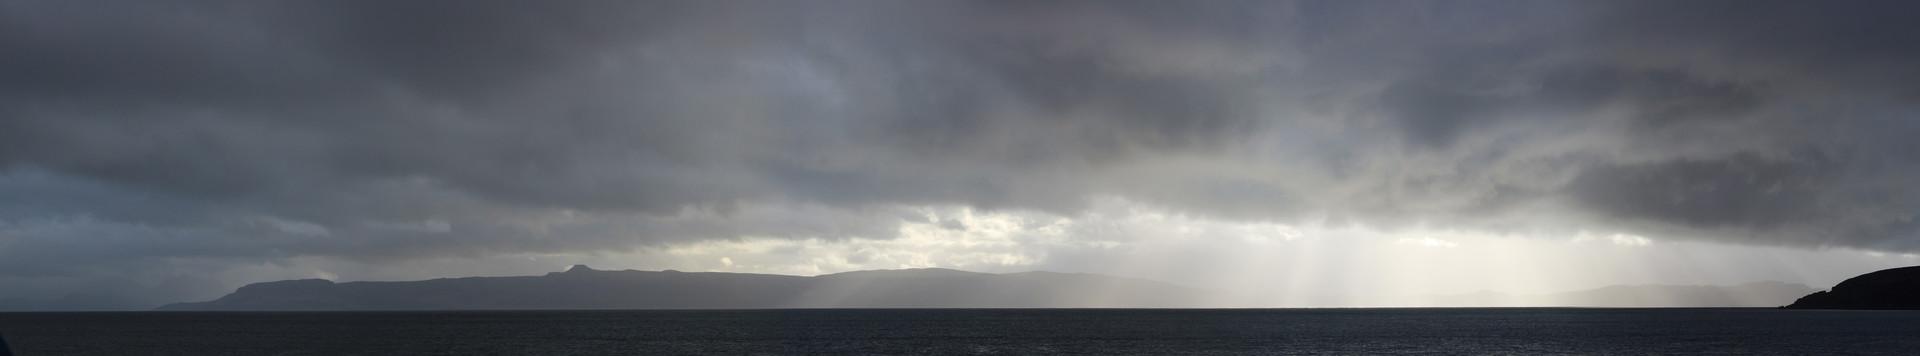 Applecross, Scotland,  1